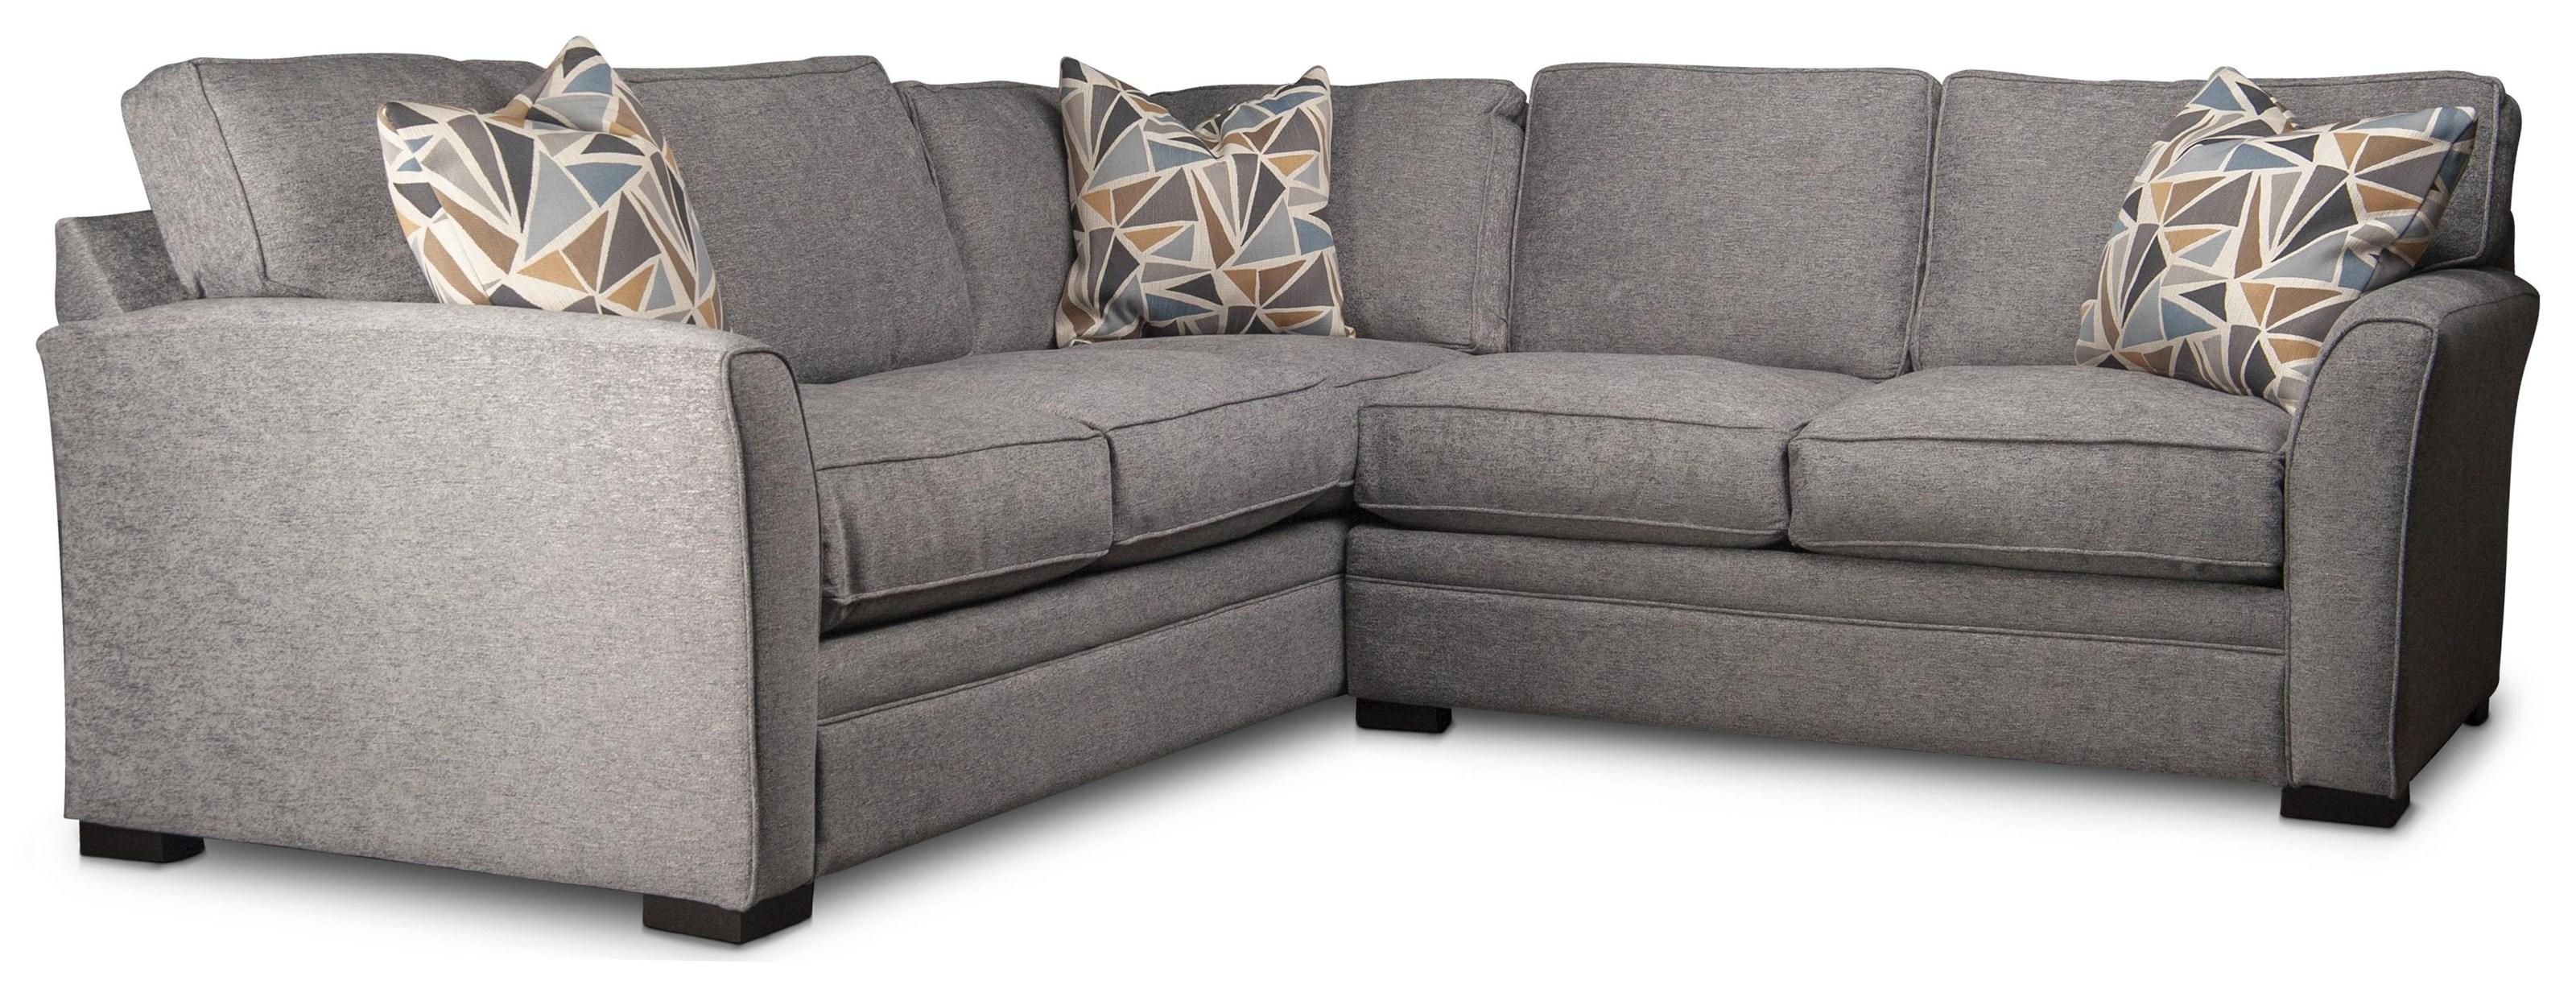 Paisley Paisley Sectional Sofa by Jonathan Louis at Morris Home